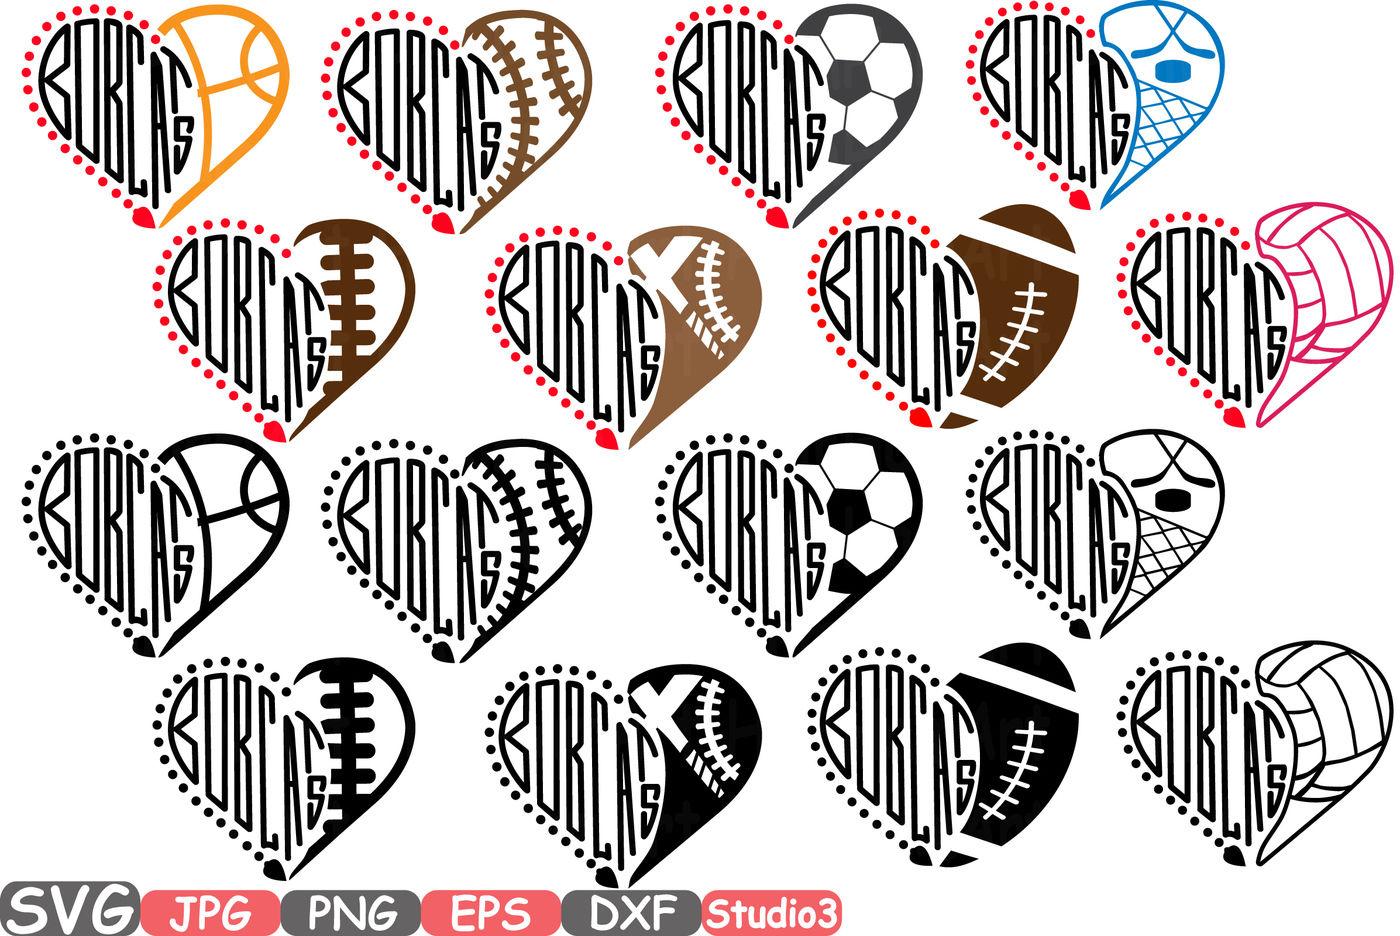 Bobcats Silhouette Svg Cutting Files Digital Clip Art Graphic